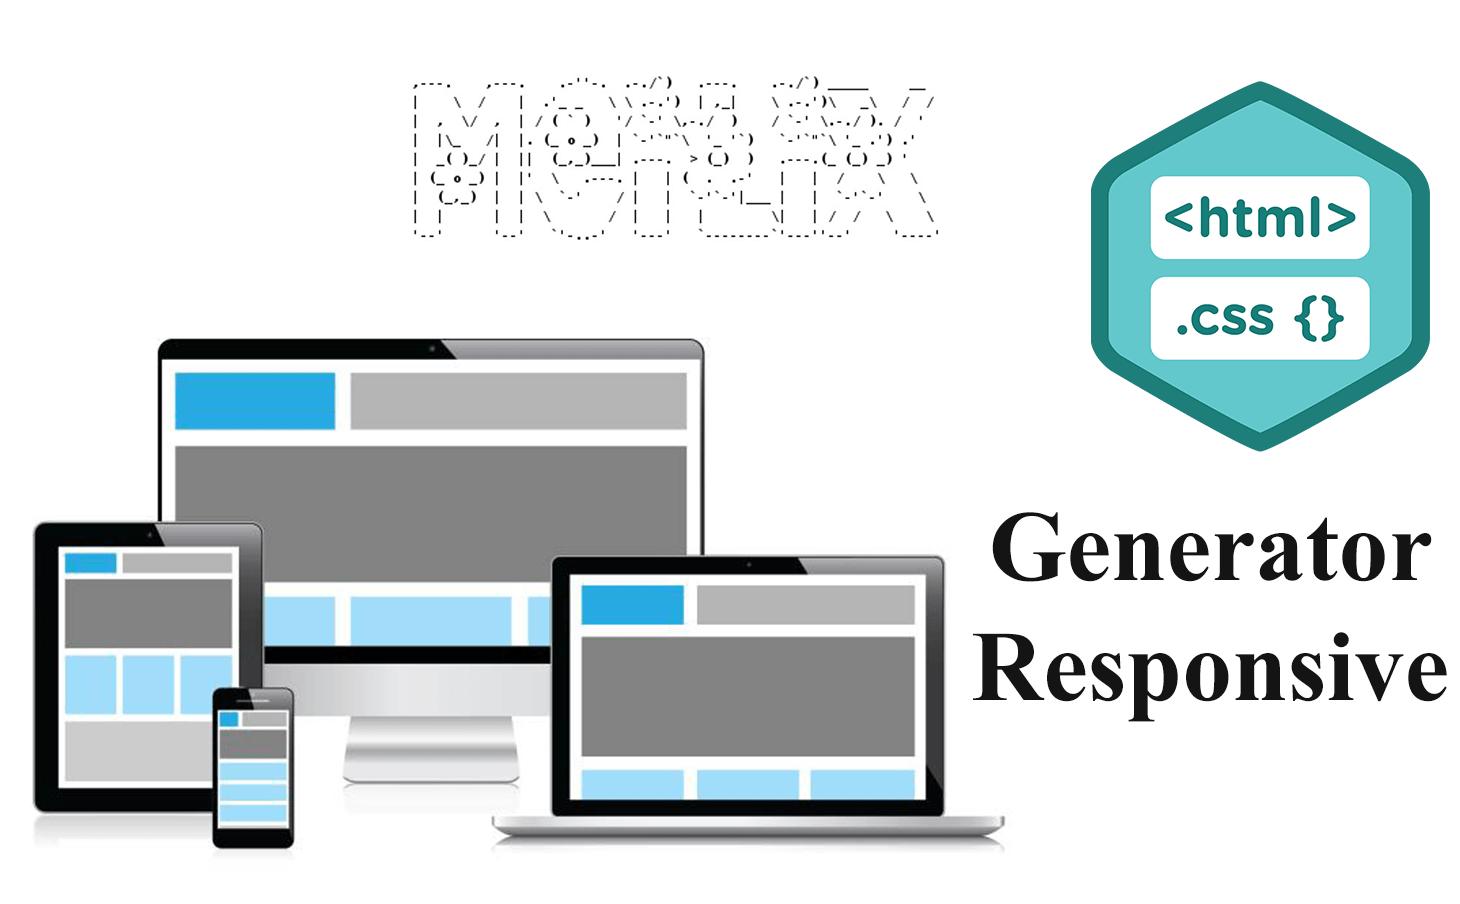 Build Button Resolution in Meilix